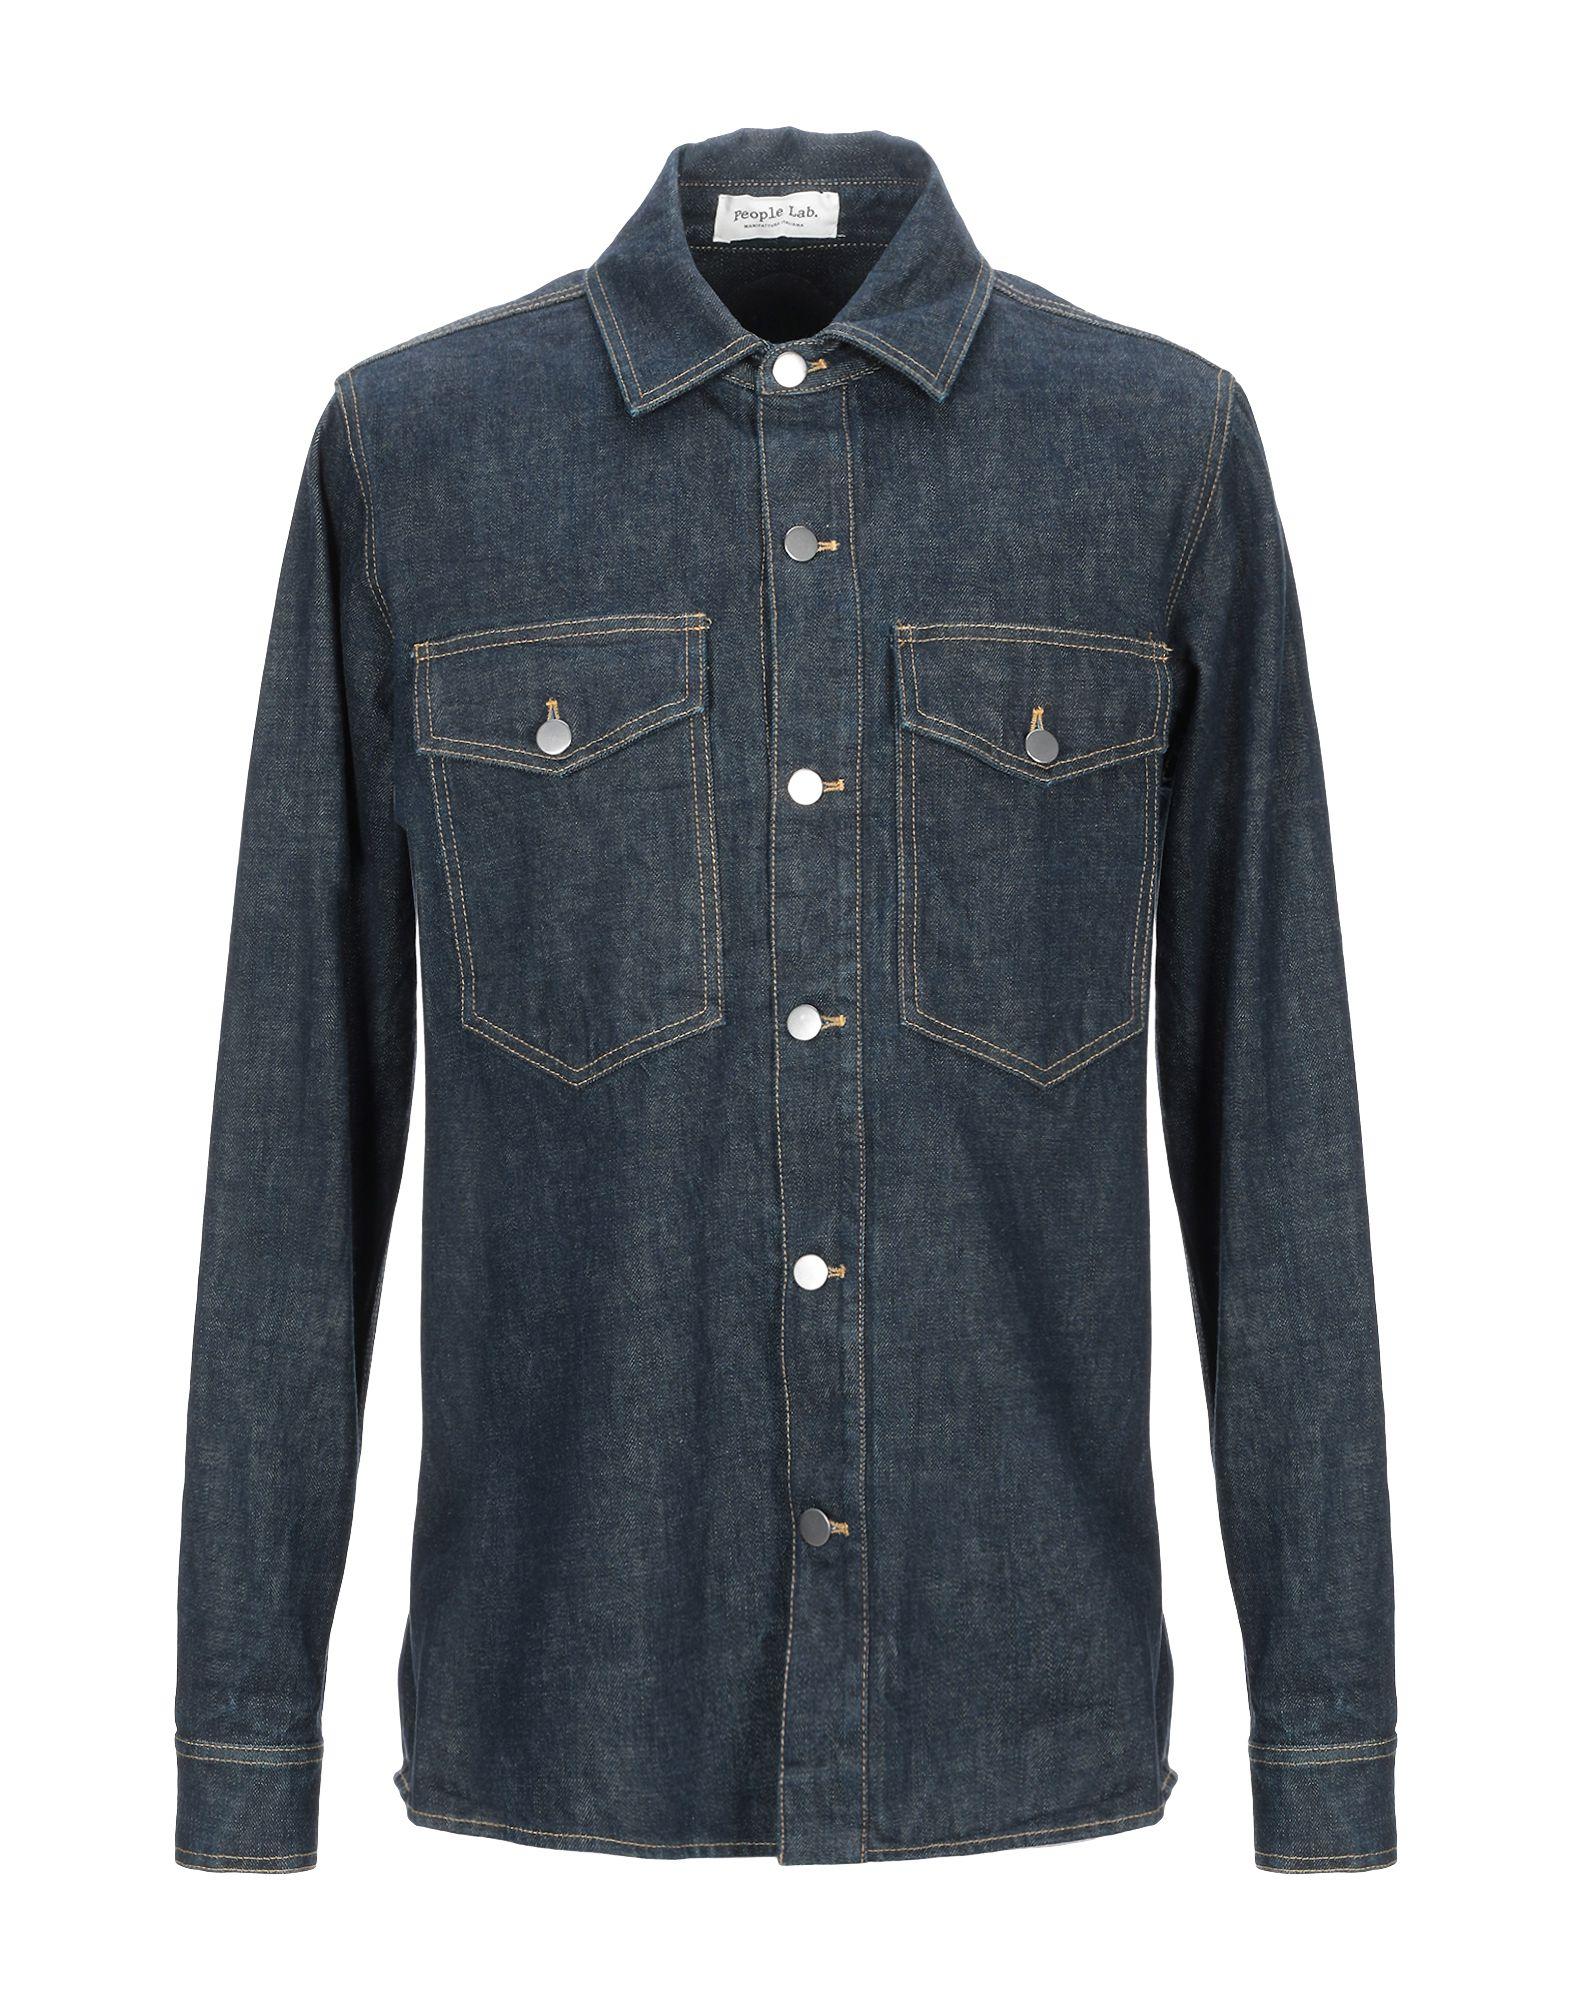 PEOPLE LAB. Джинсовая рубашка people джинсовая рубашка